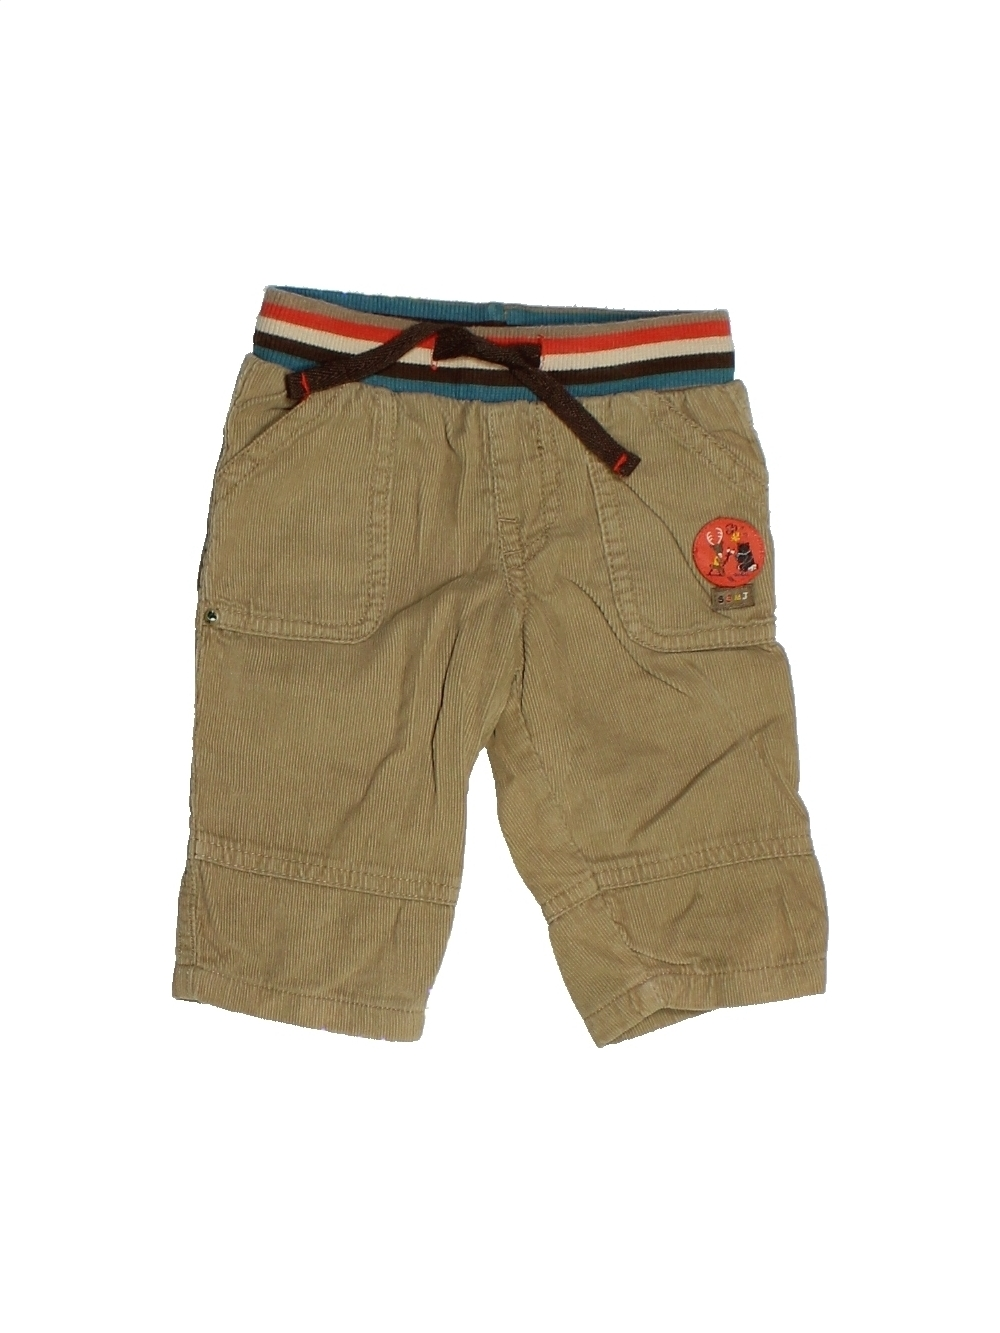 Pantalon-bebe-garcon-SERGENT-MAJOR-3-mois-marron-hiver-vetement-bebe-11